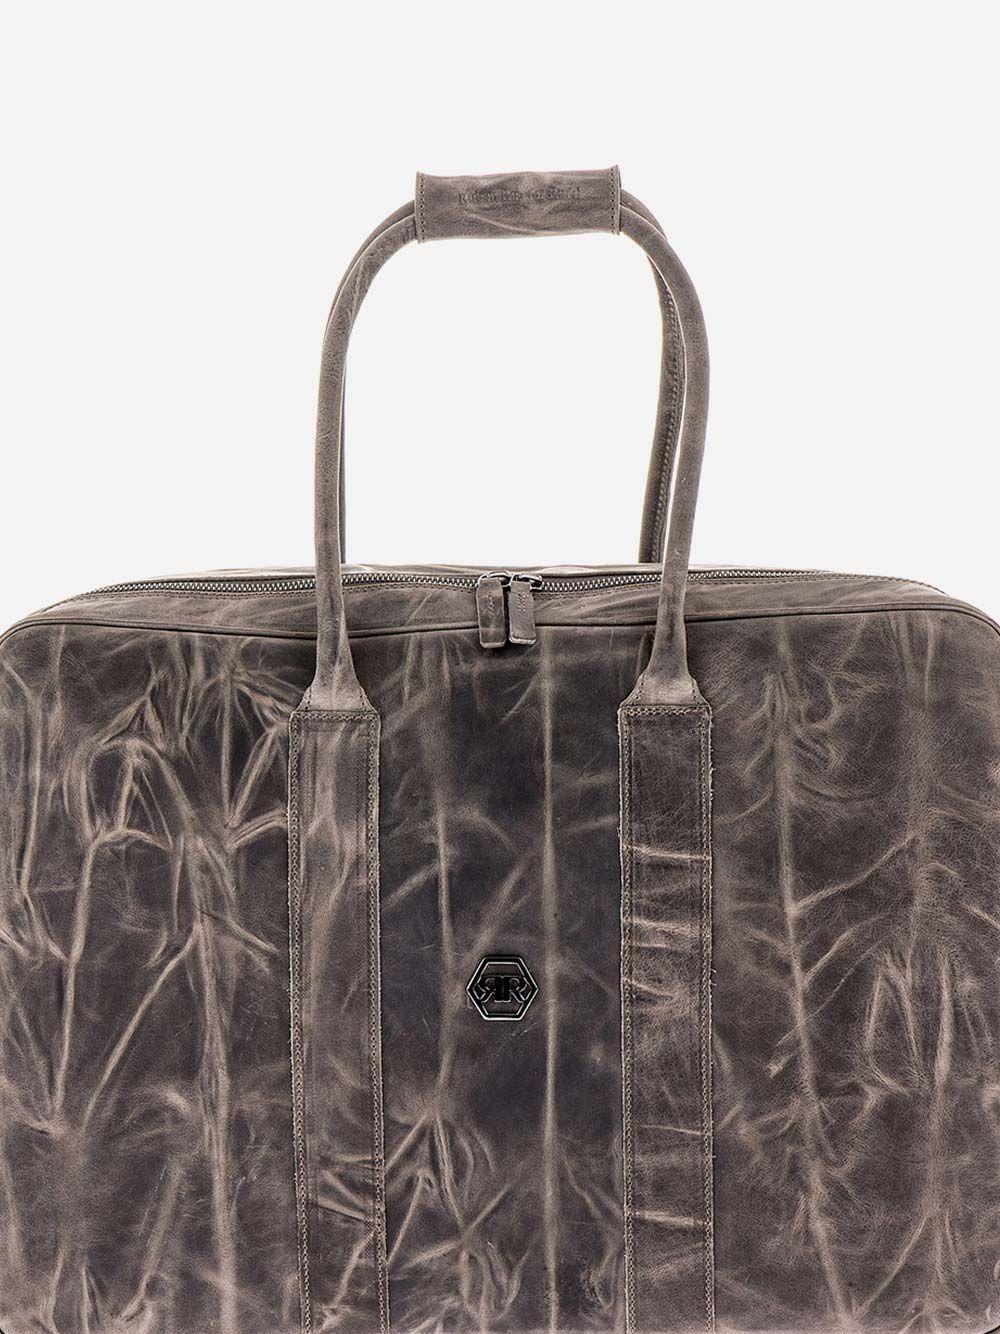 Taupe Weekend Bag | Rufel